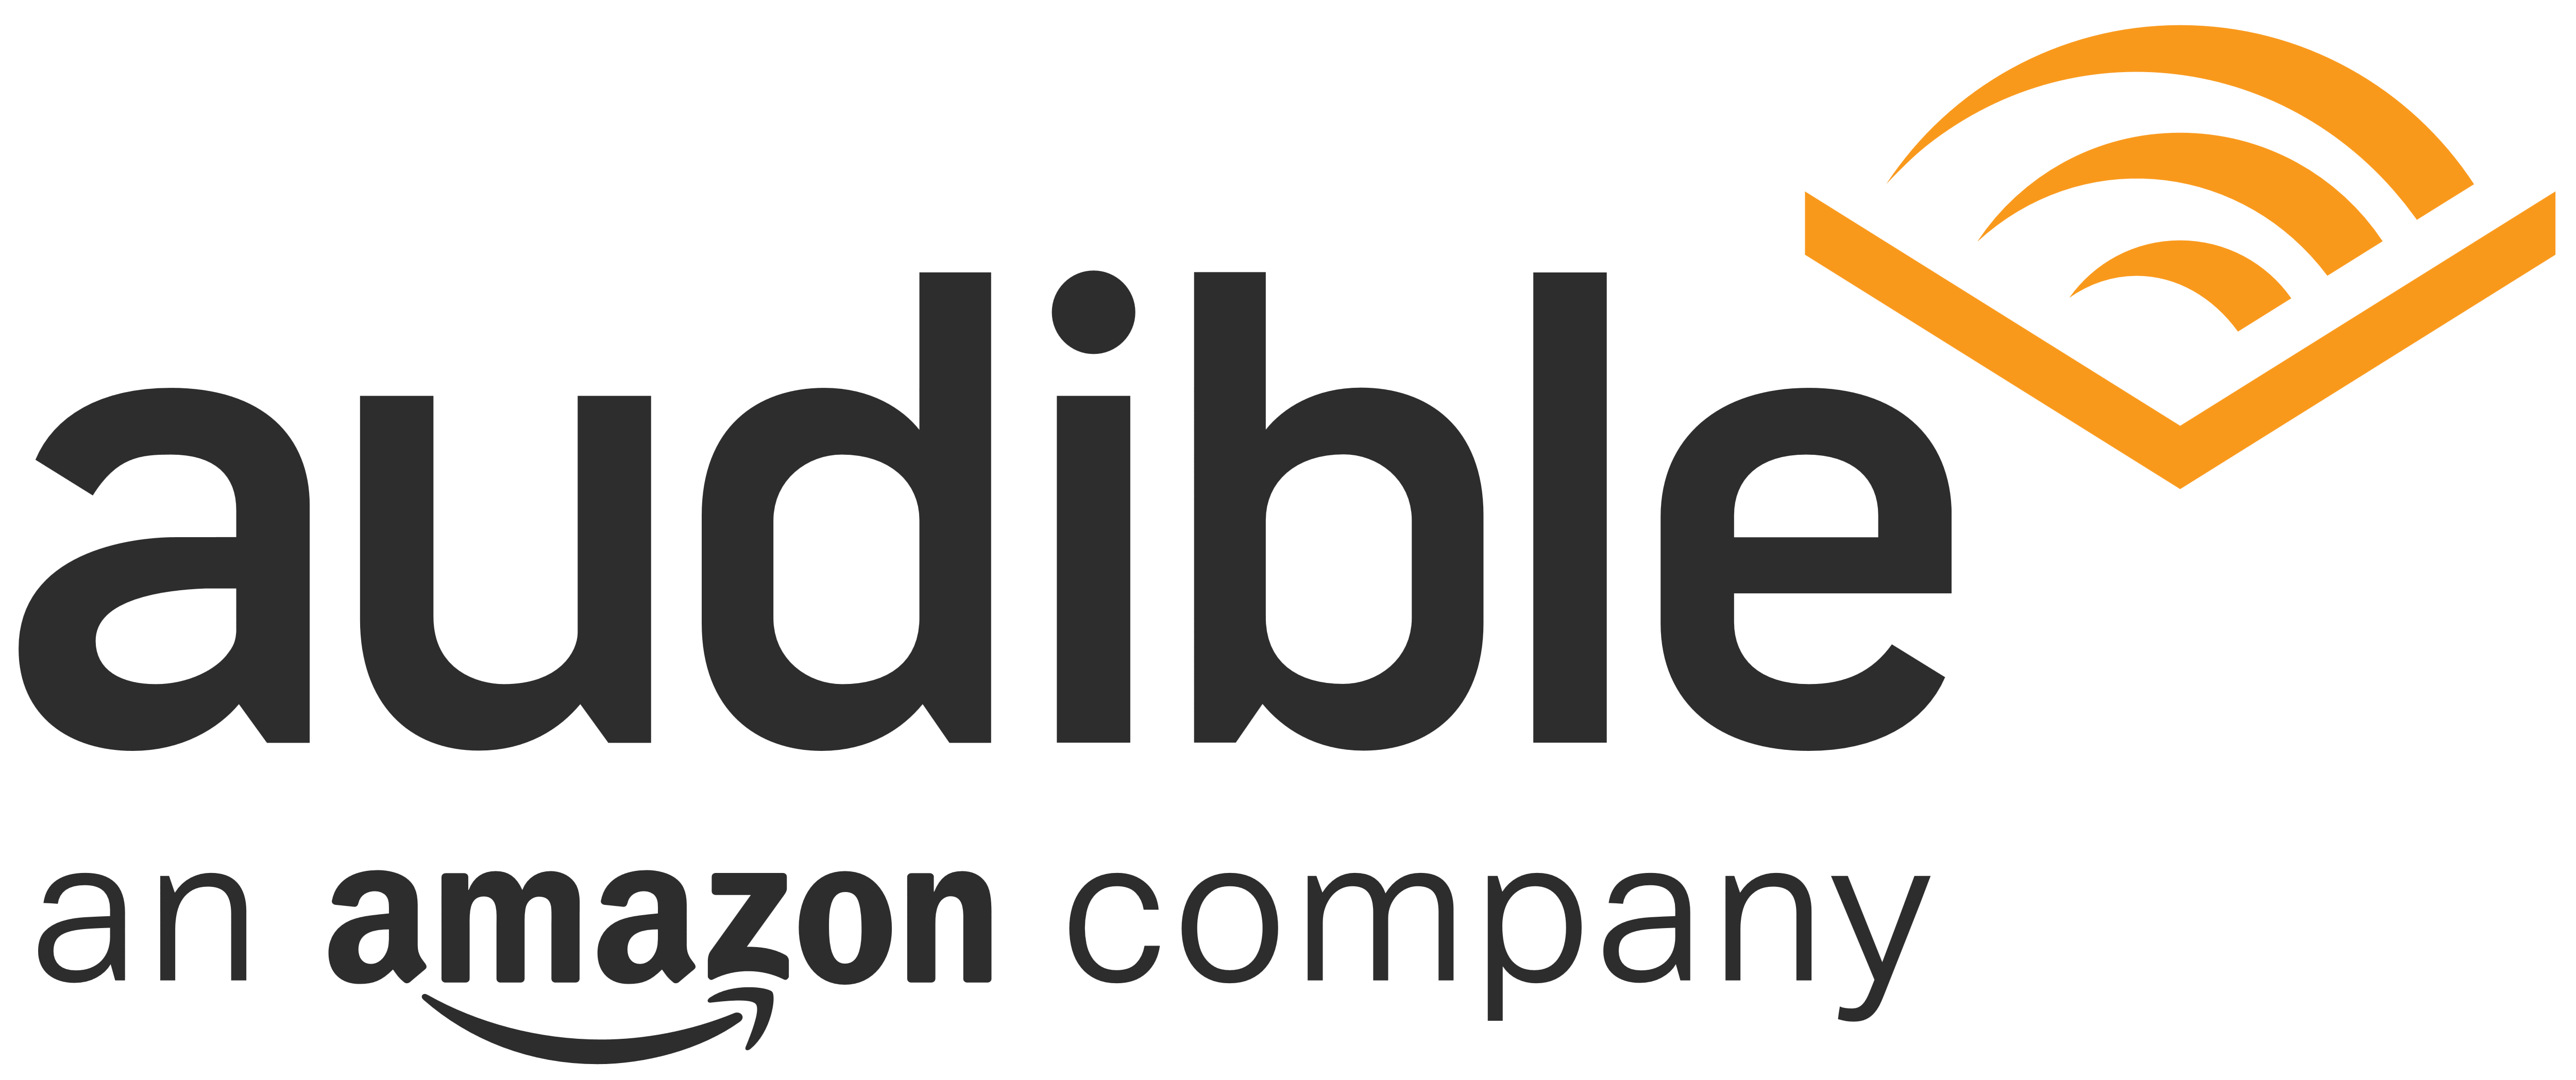 Audible_logo_an_Amazon_company